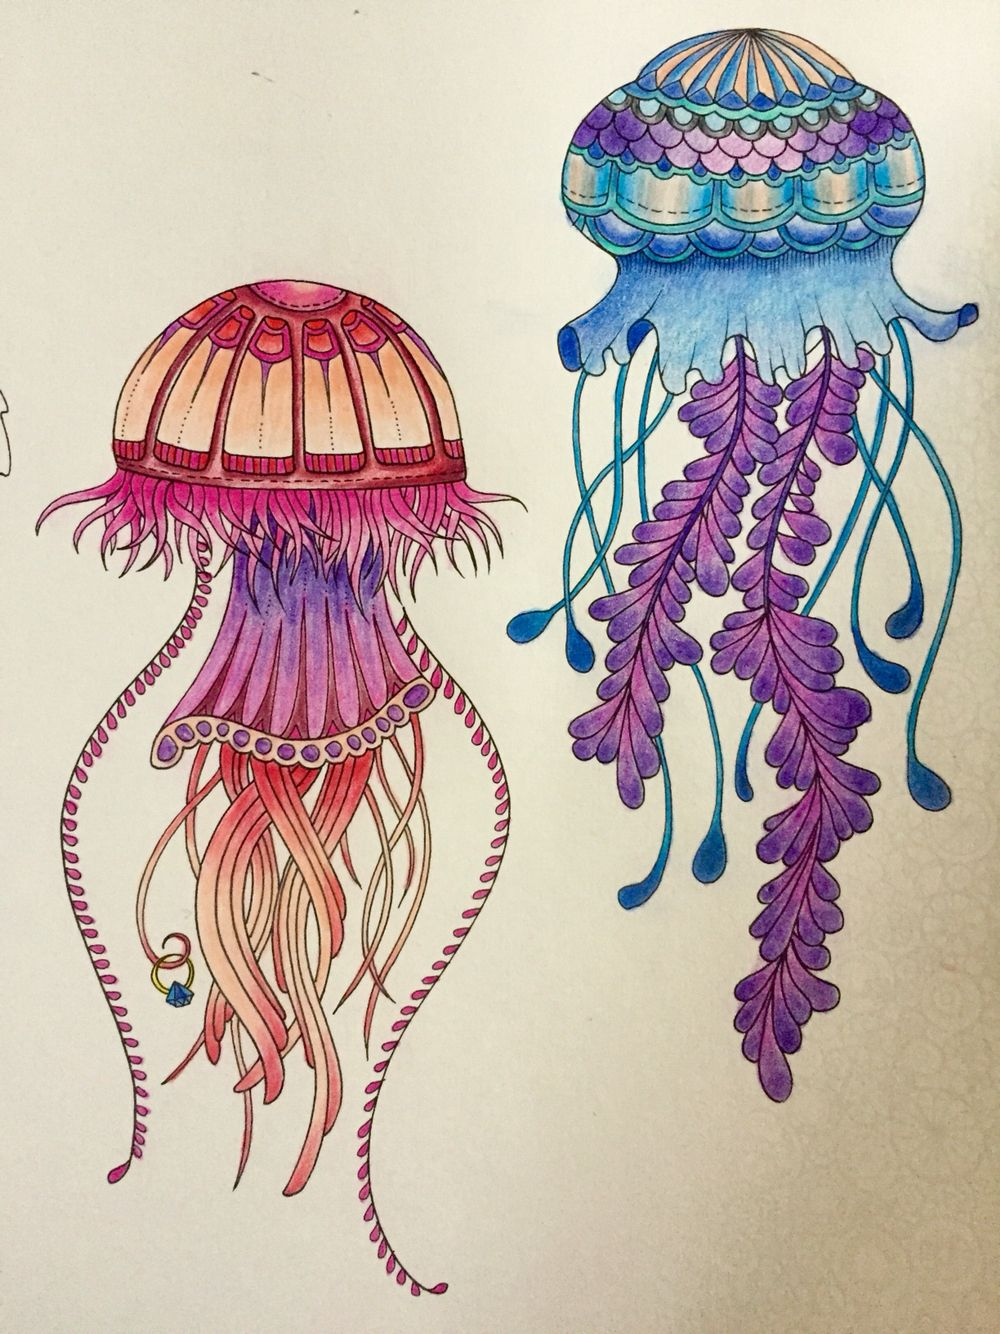 Zen ocean colouring book - Jellyfish Lost Ocean By Johanna Basford